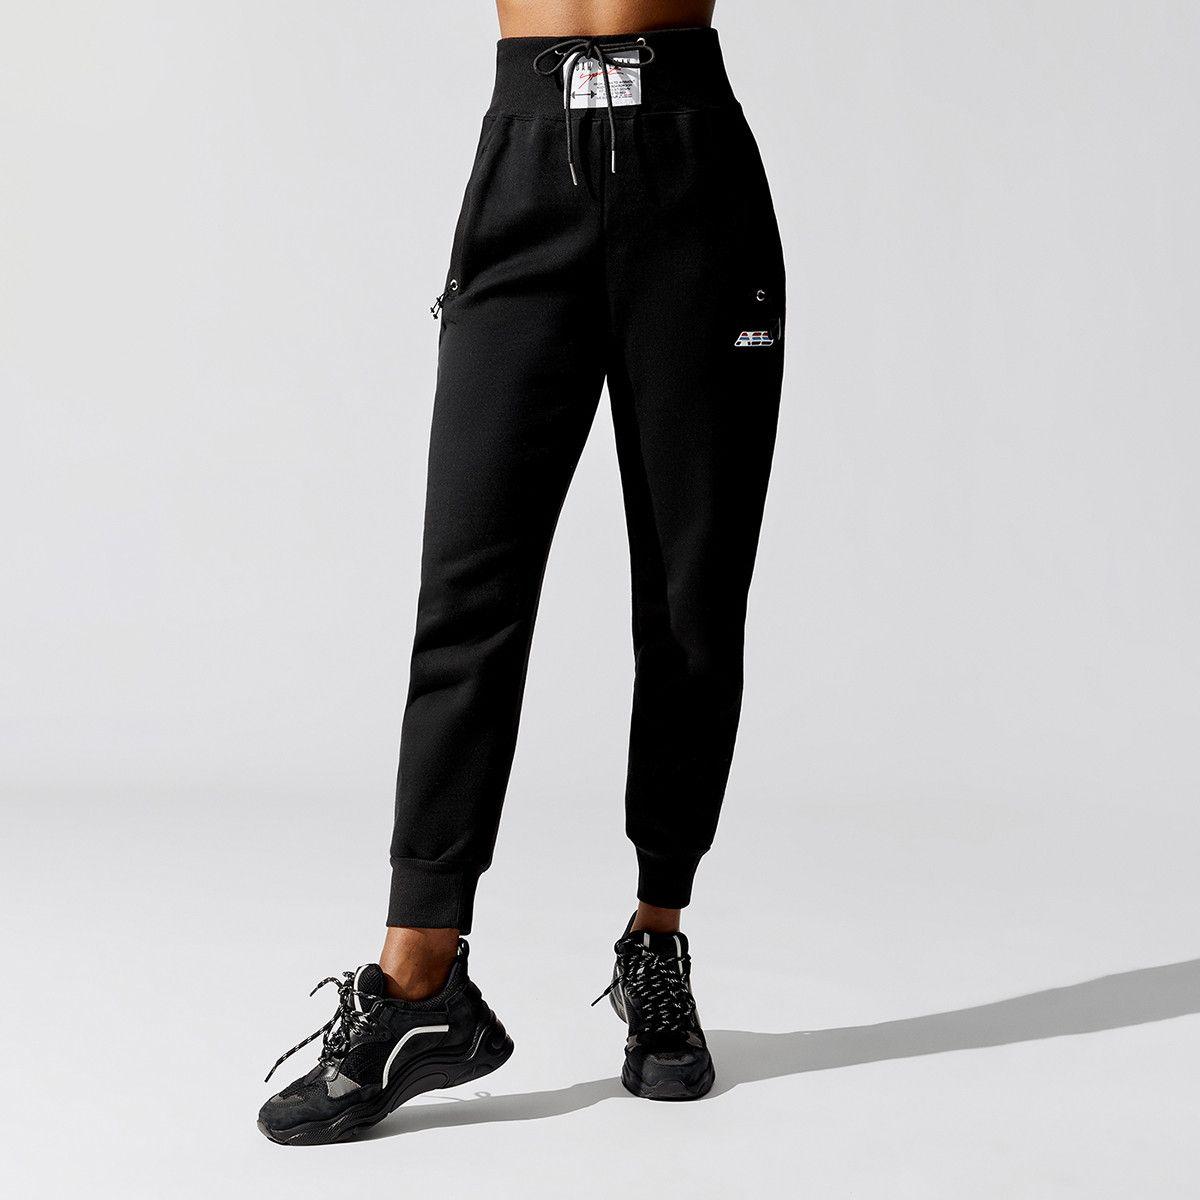 HIRISE SWEATPANT in 2020 Sweatpants, Sporty look, Black